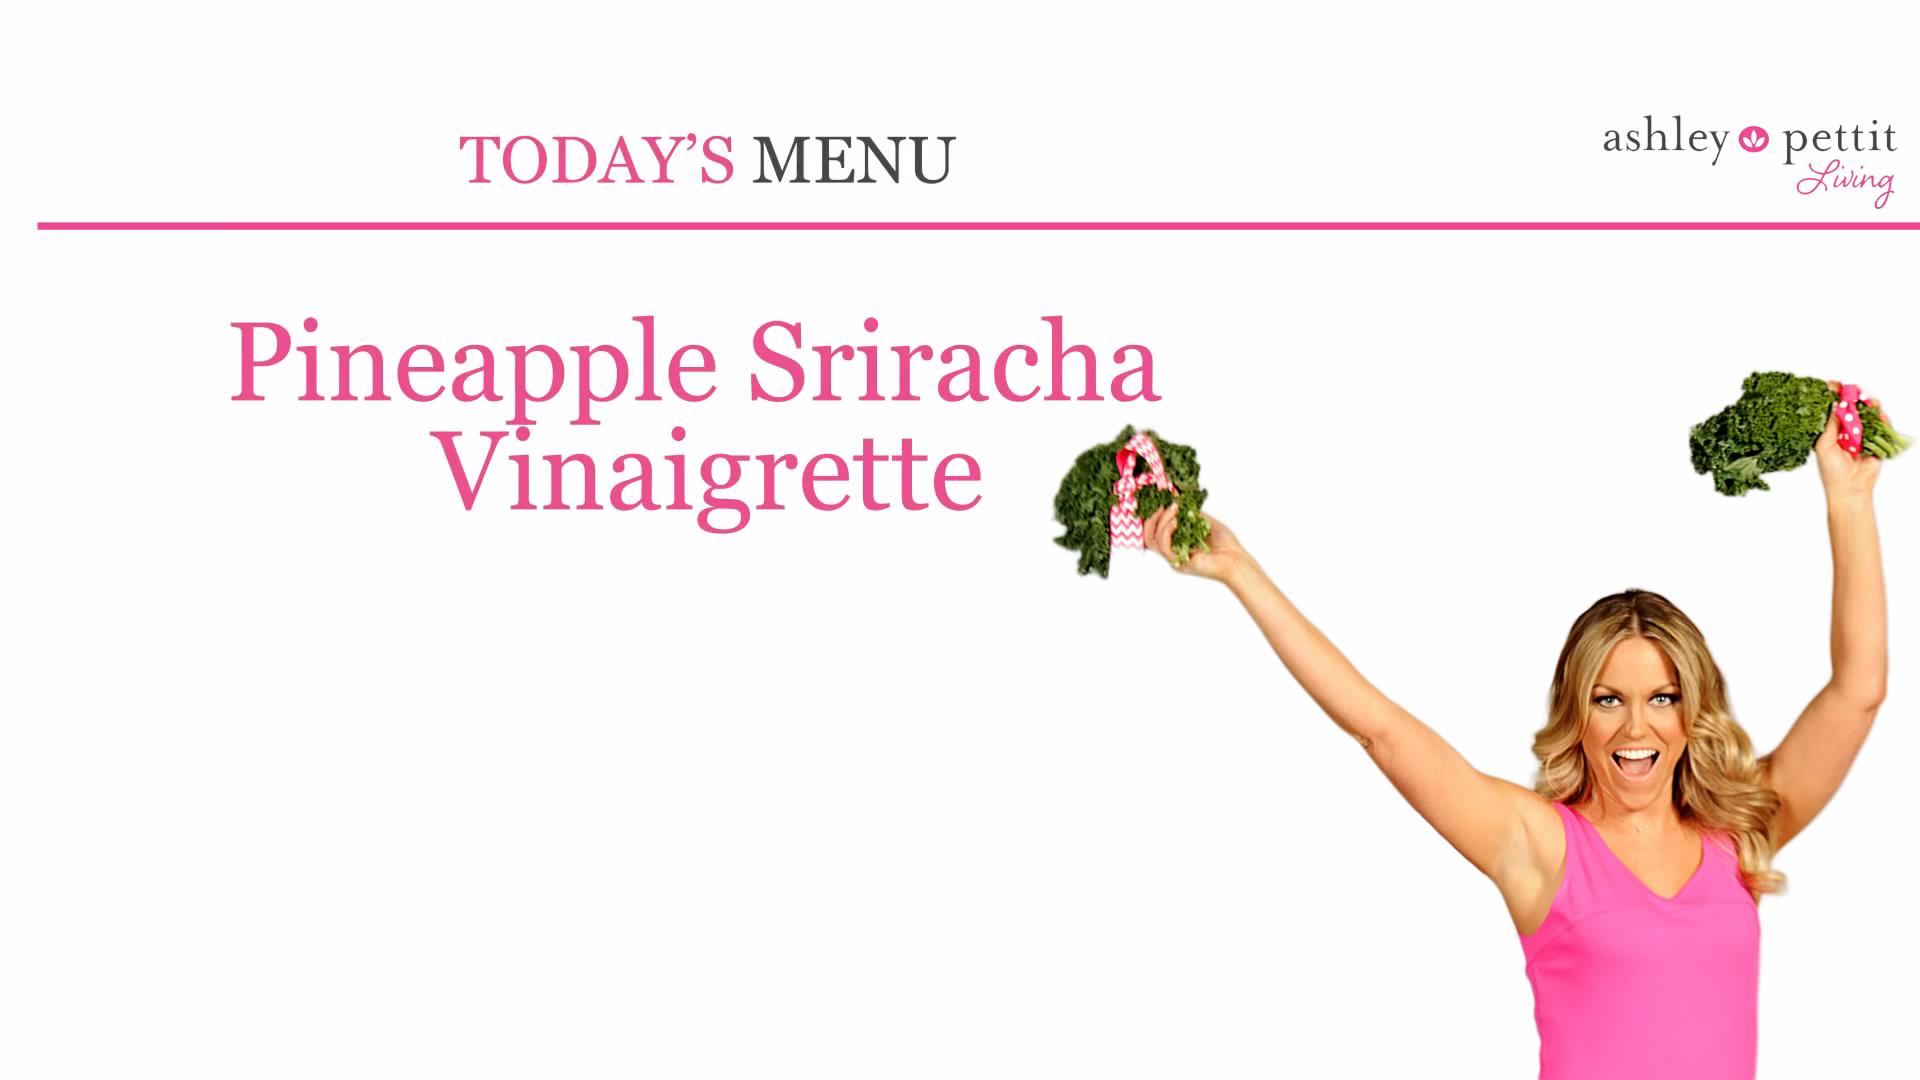 Ashley Pettit Living: Pineapple Sriracha Vinaigrette